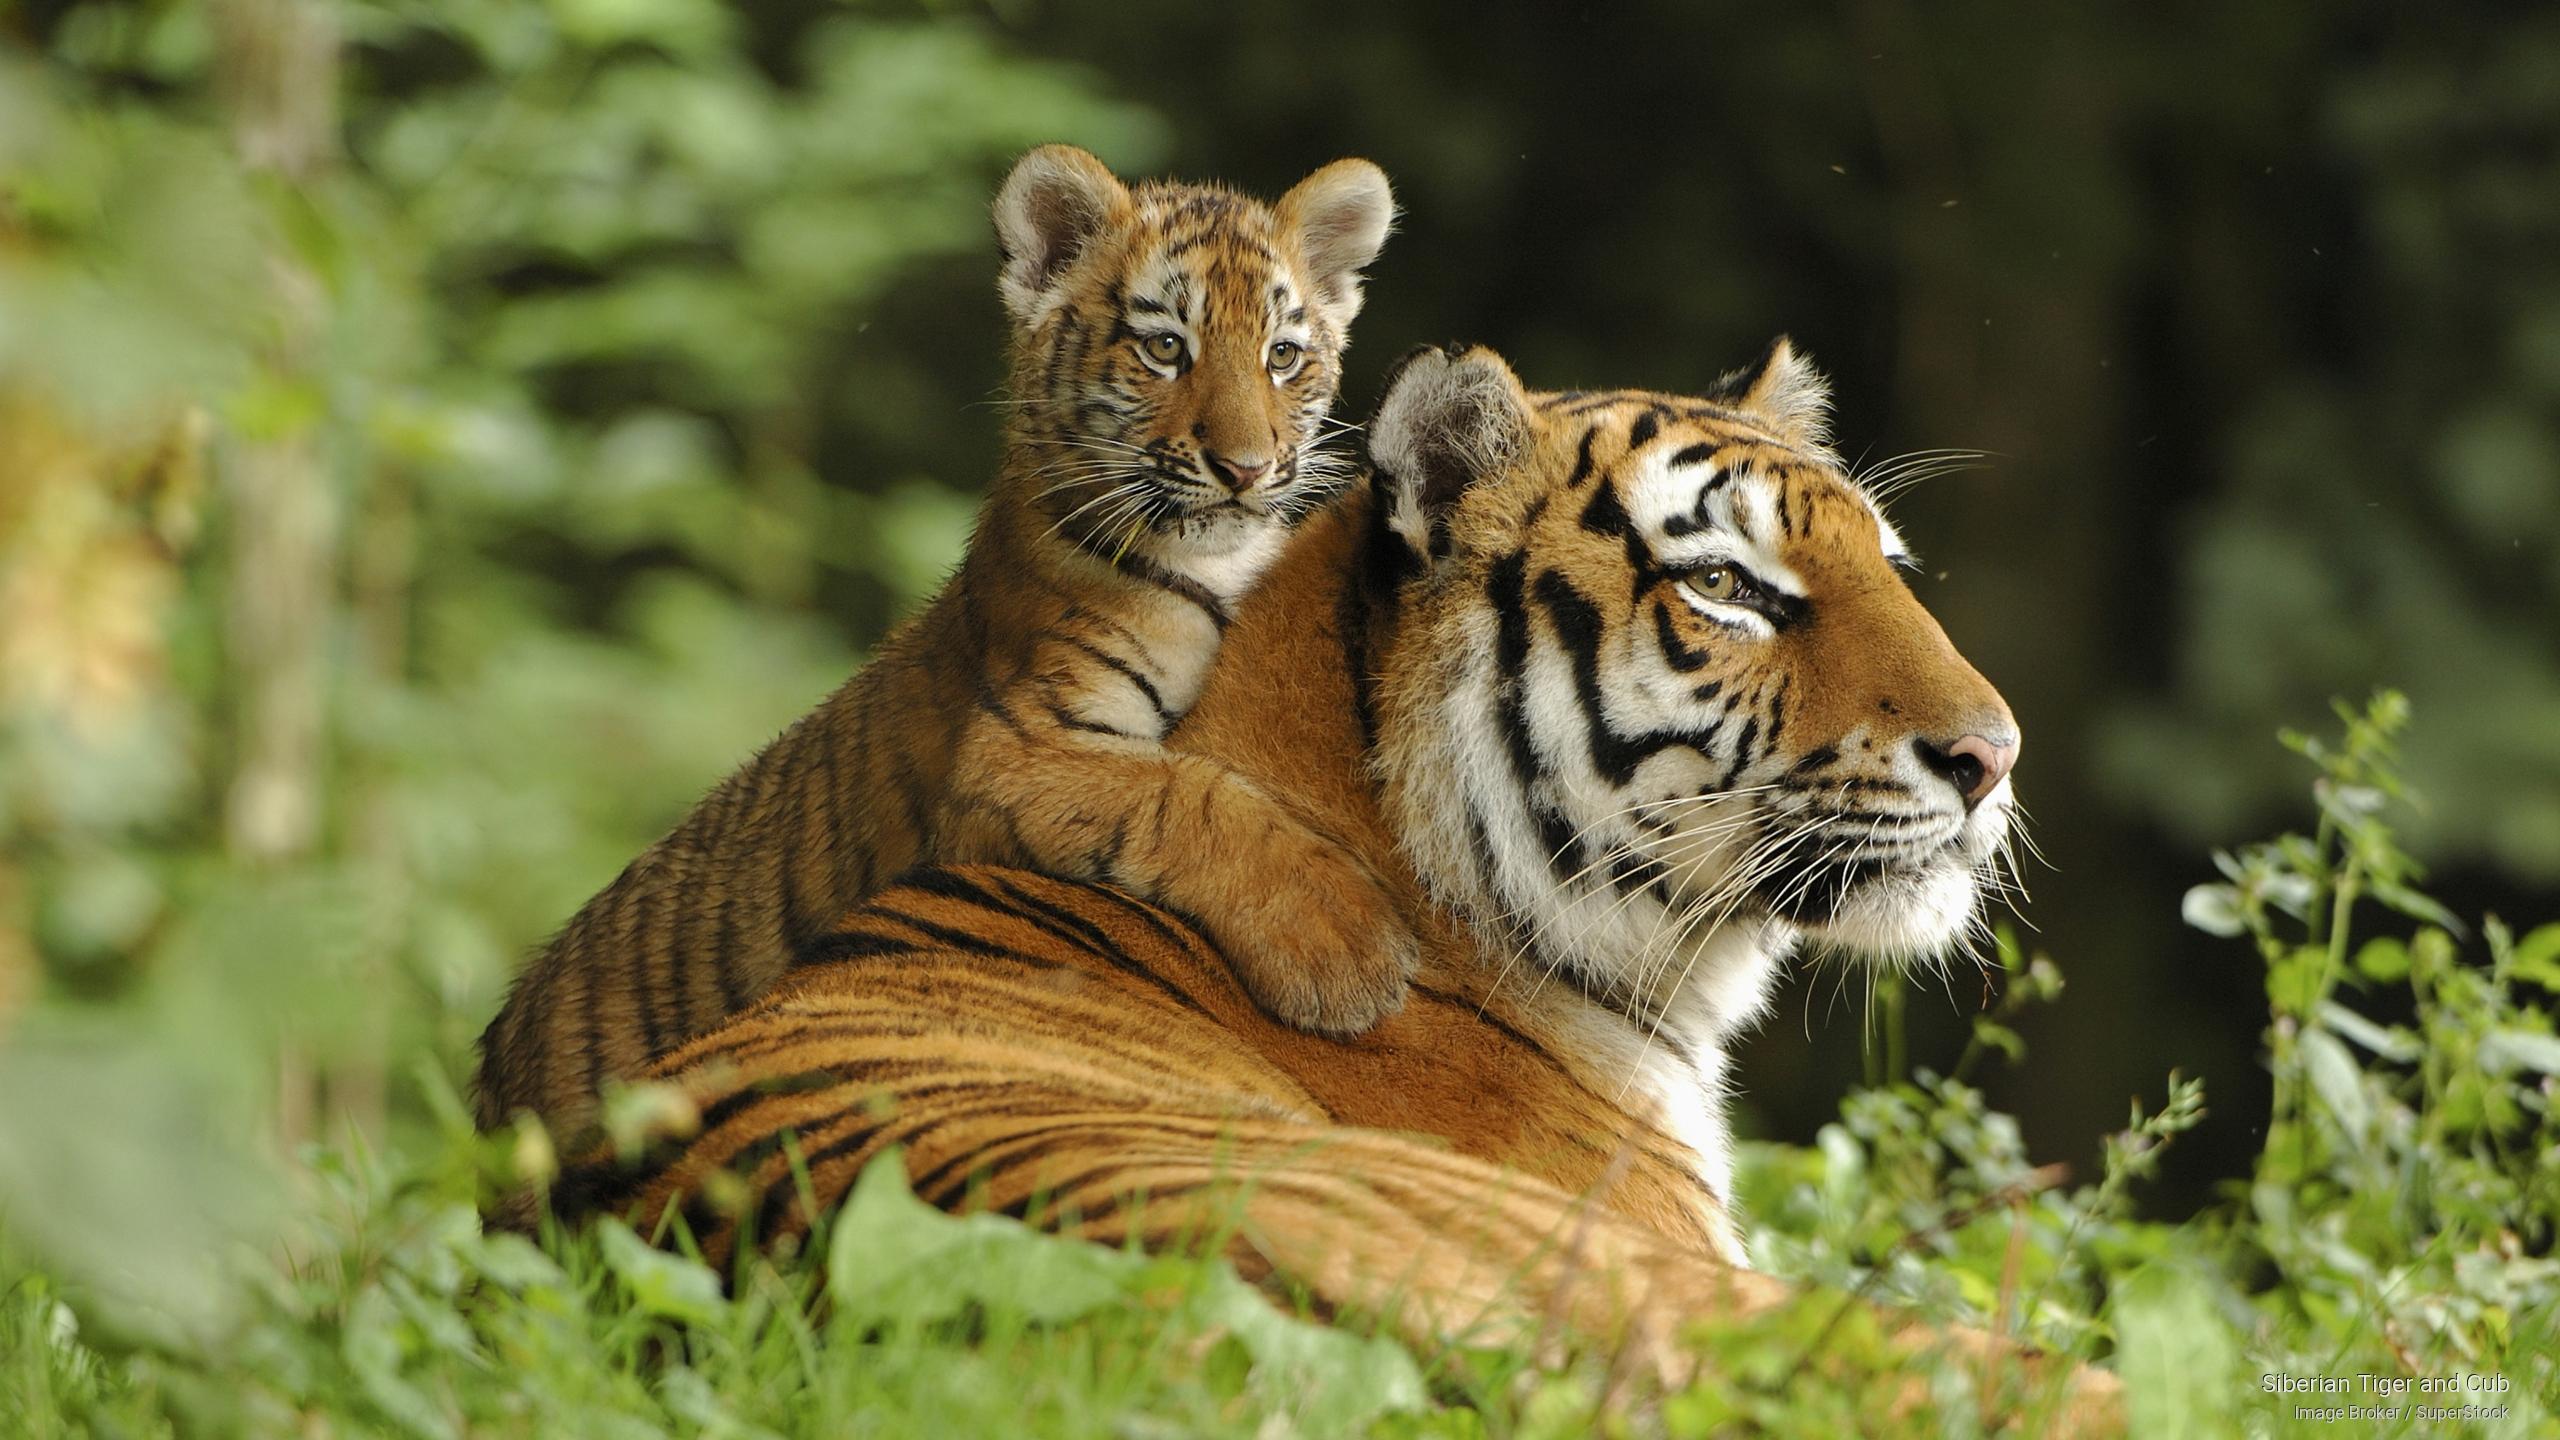 2560x1440px Siberian Tiger Wallpaper - WallpaperSafari